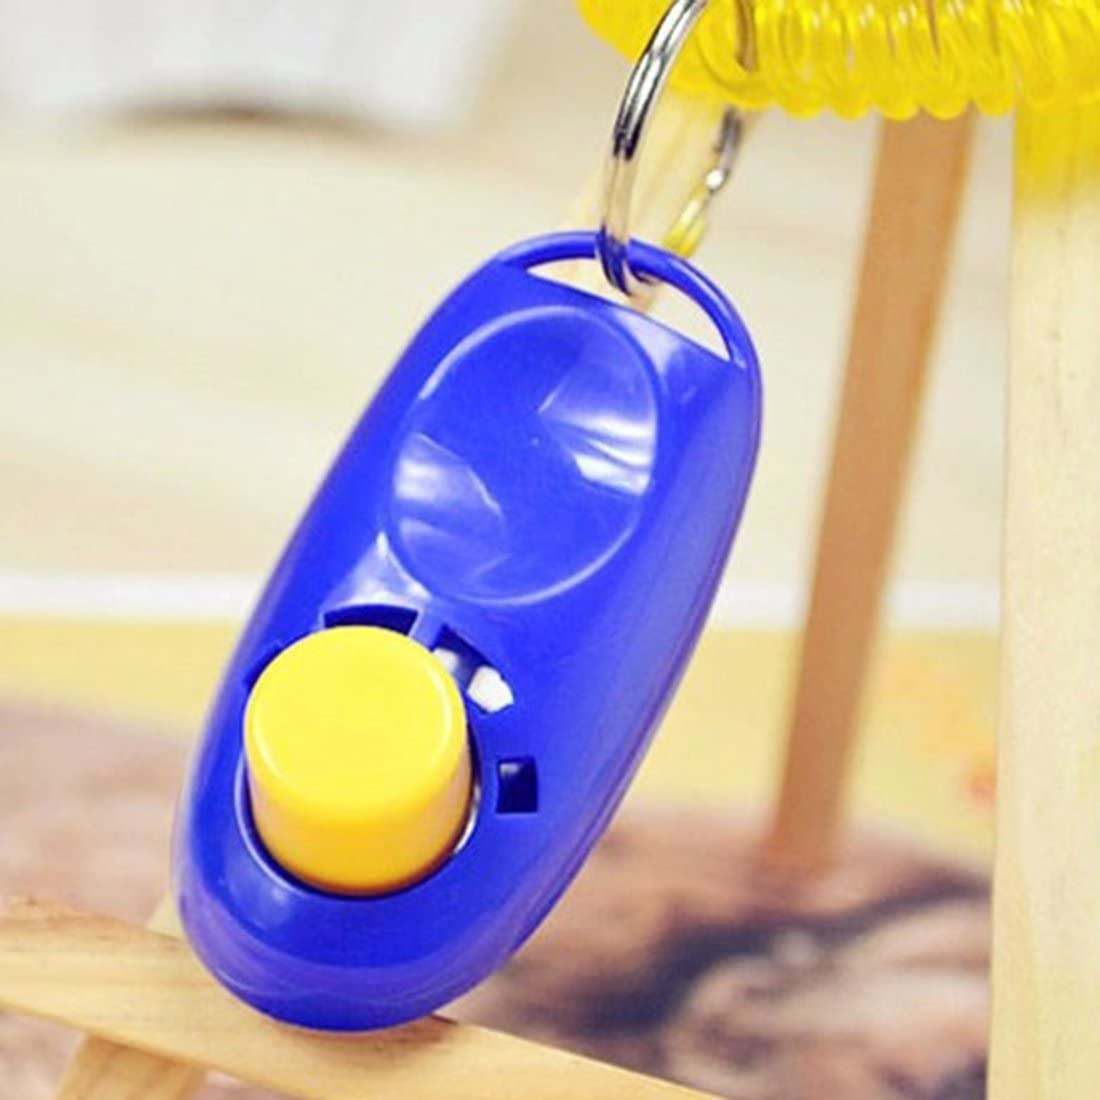 Animal Pet Training Clicker Obedience Aid Wrist Strap Light Weight Universal Mini Mini Convenient